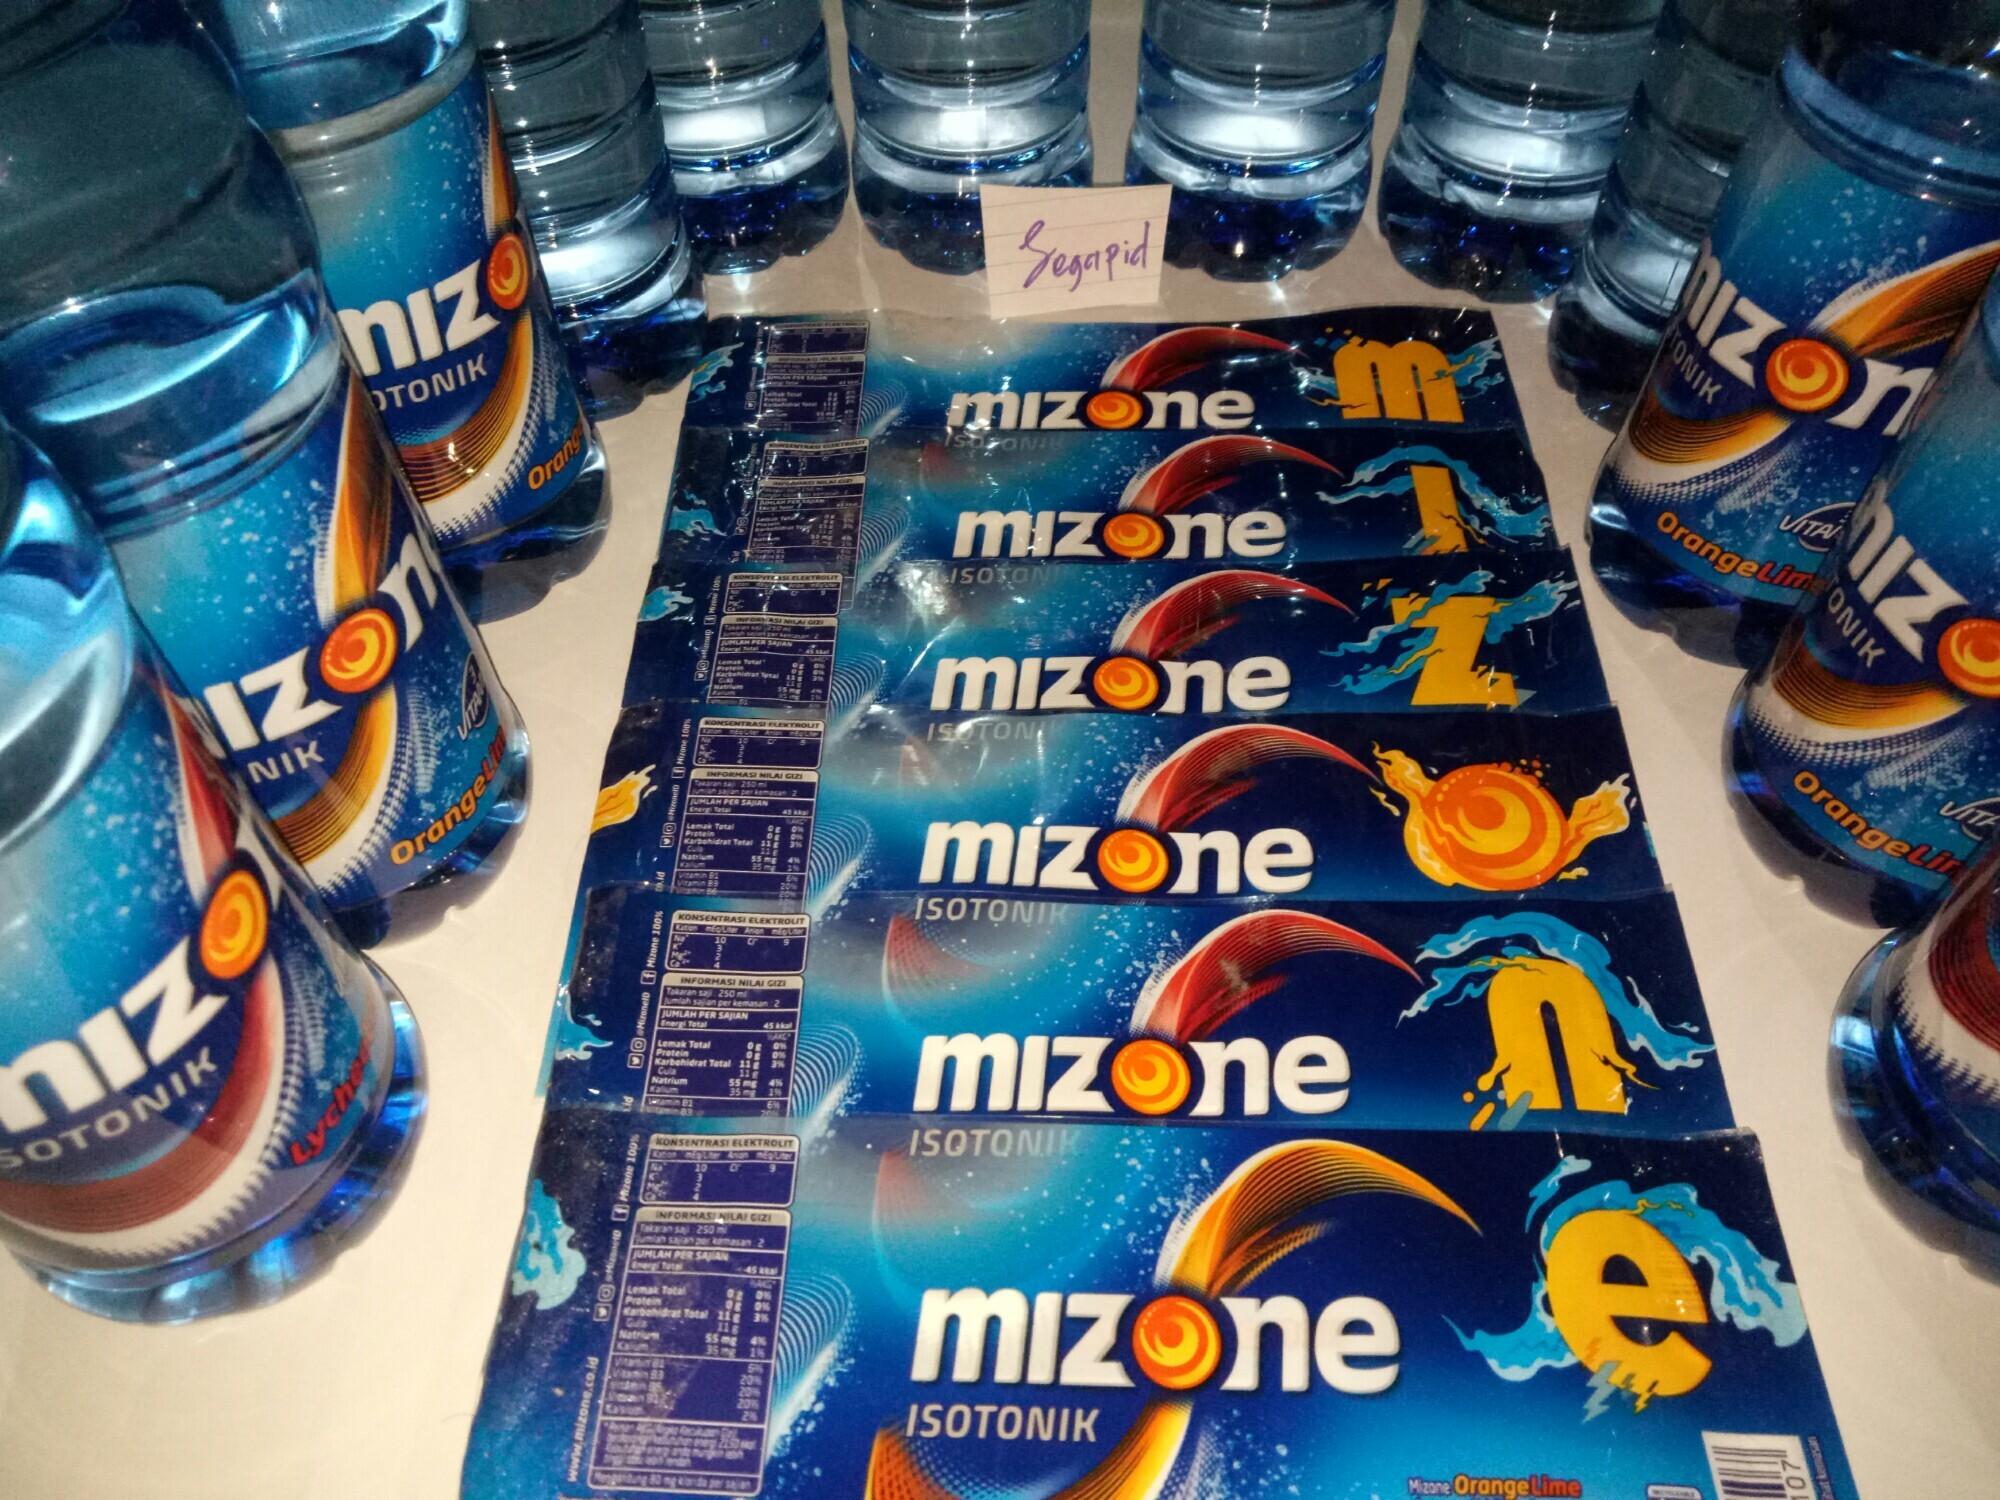 #KASKUSxMizone Mizone, Kesegaran yang Haqiqi, Ada di Dalamnya